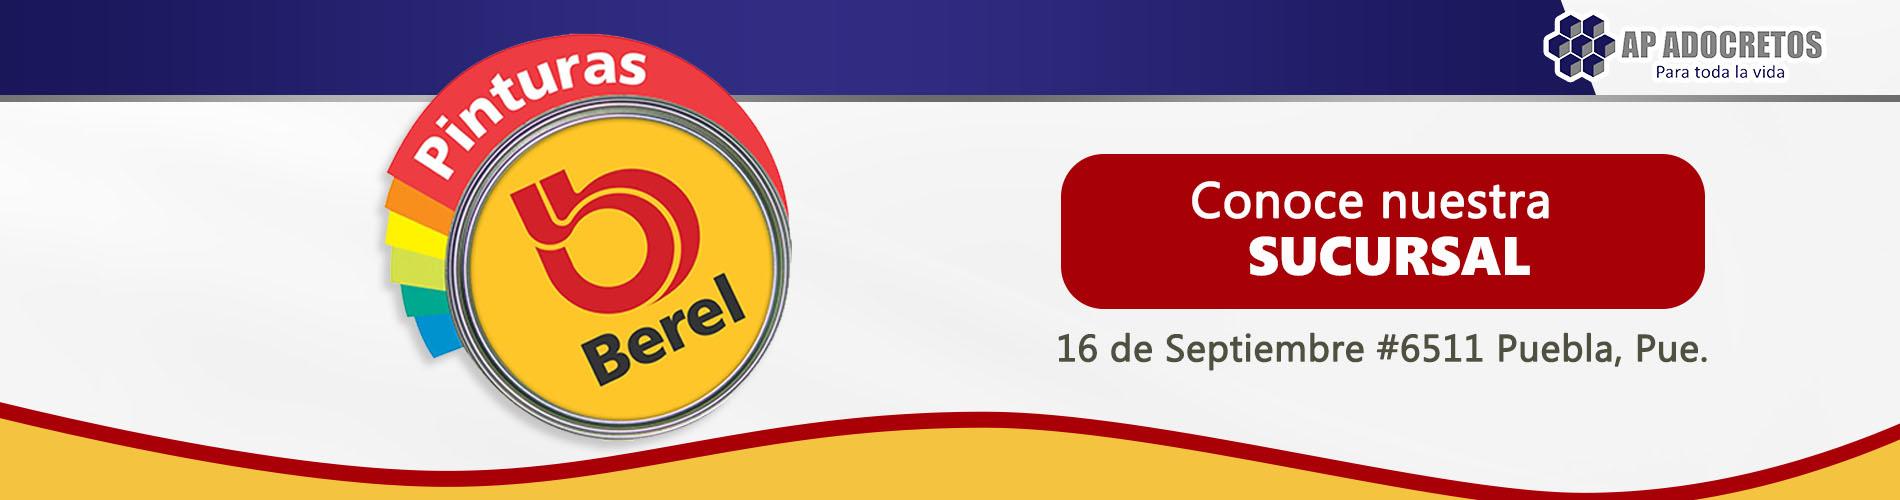 Banners_WEB_berel